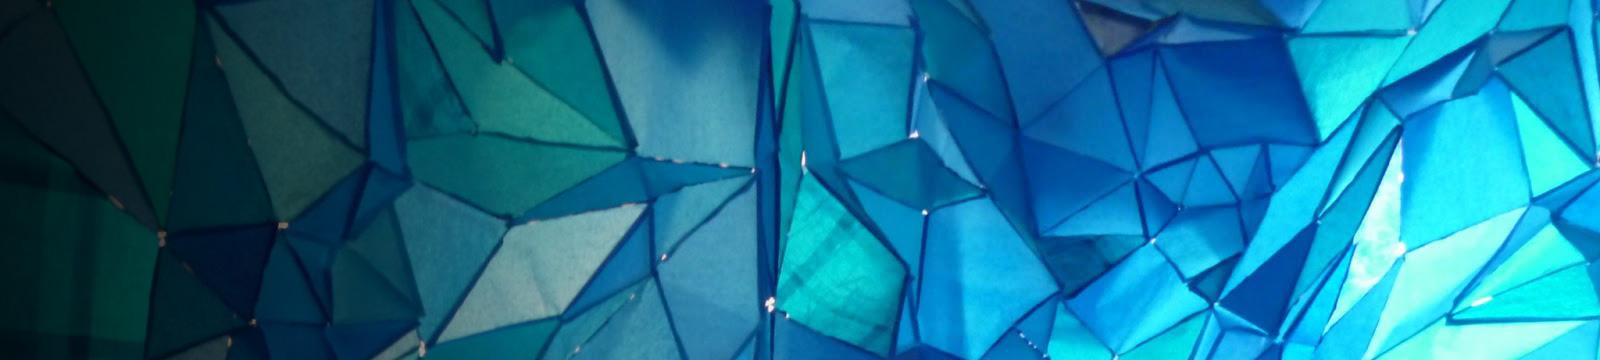 Geometric art that resembles ice